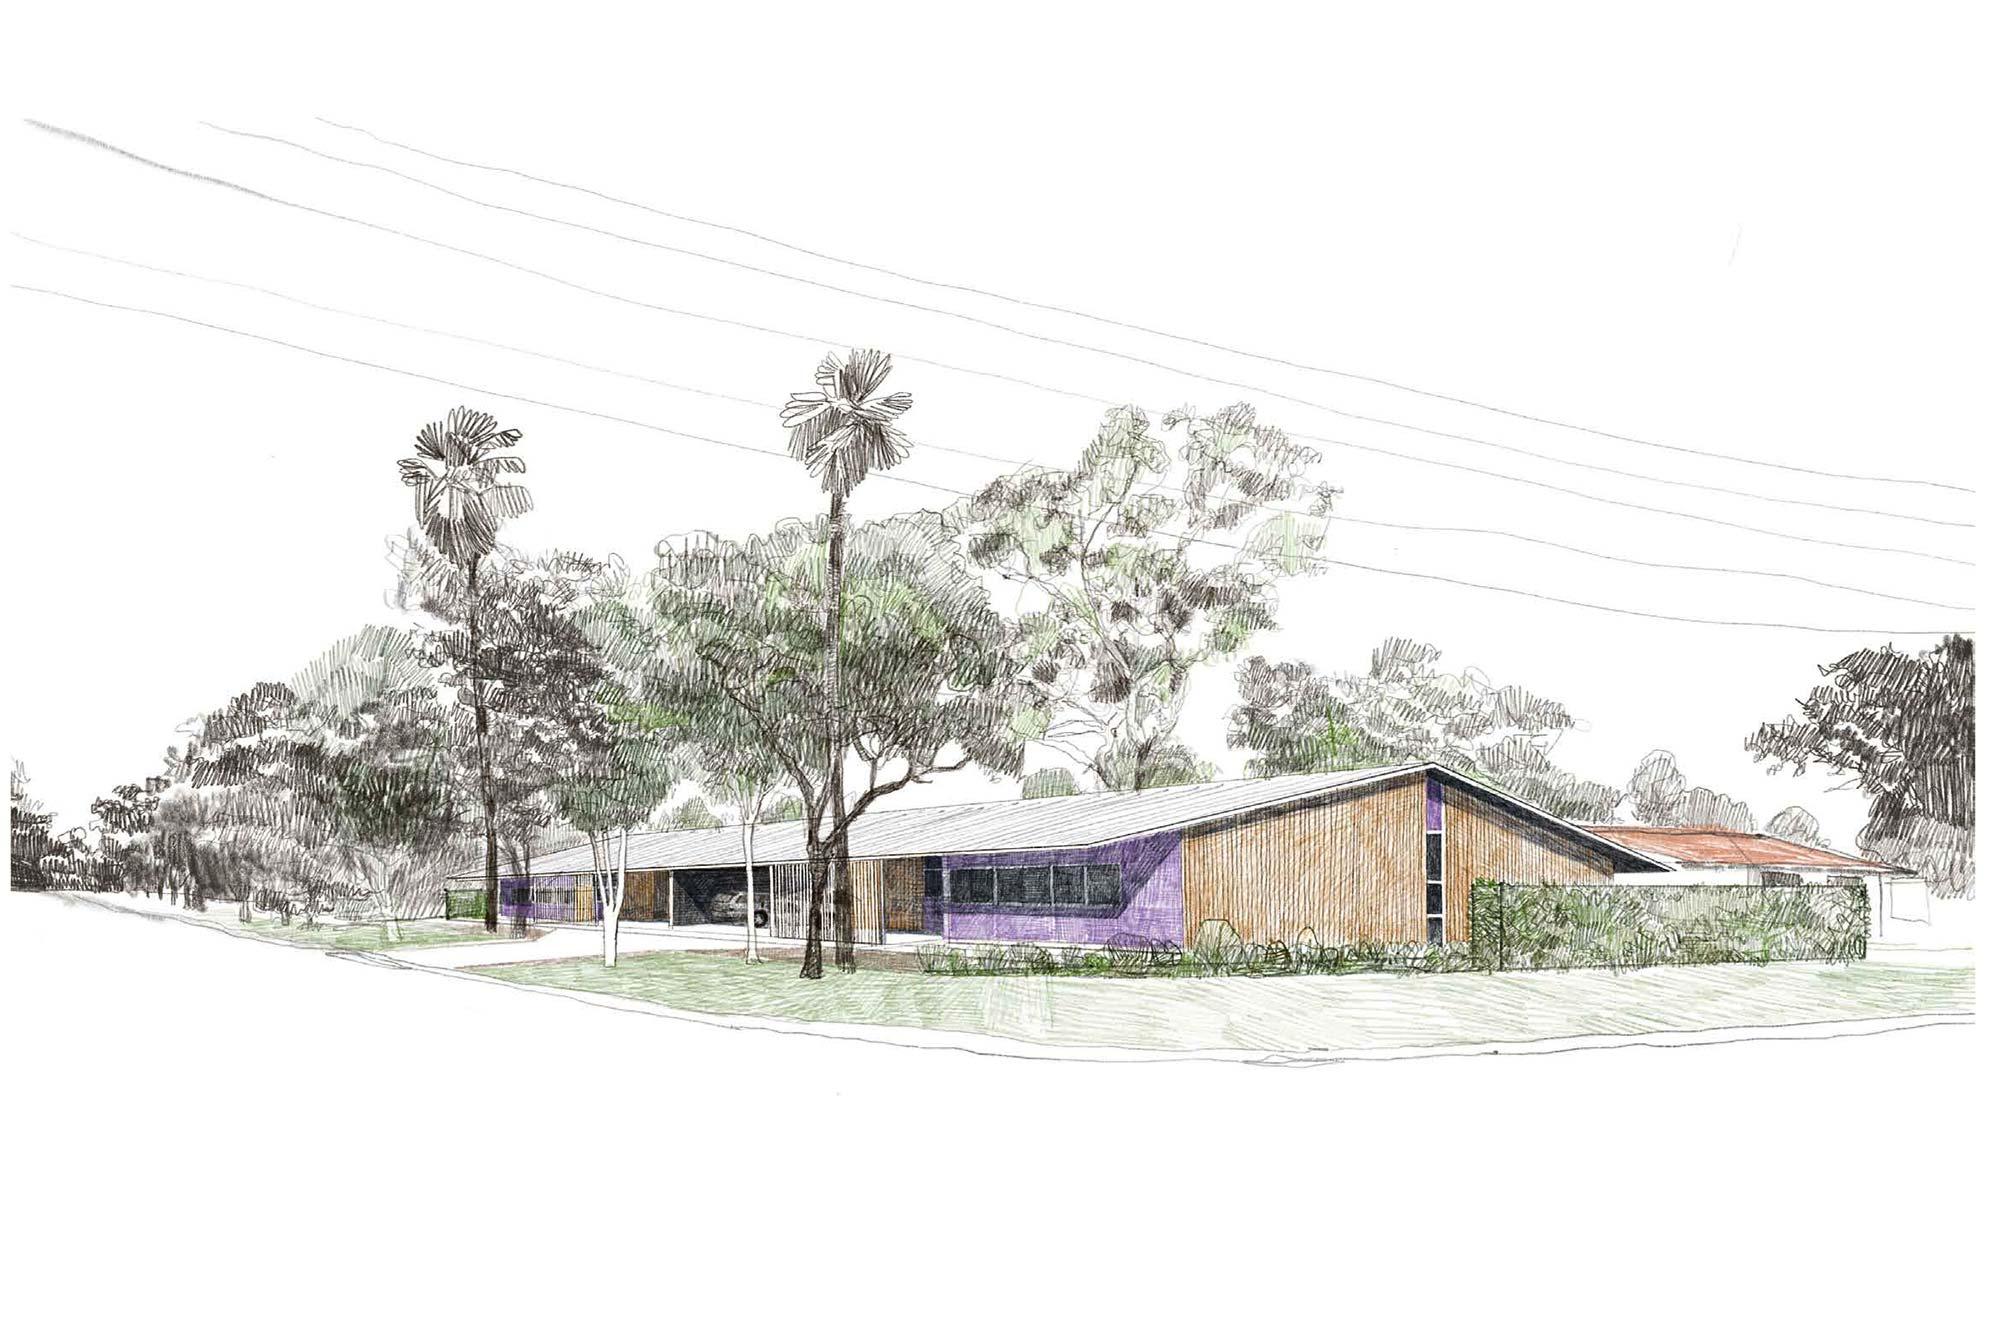 aboriginal-housing-1.jpg